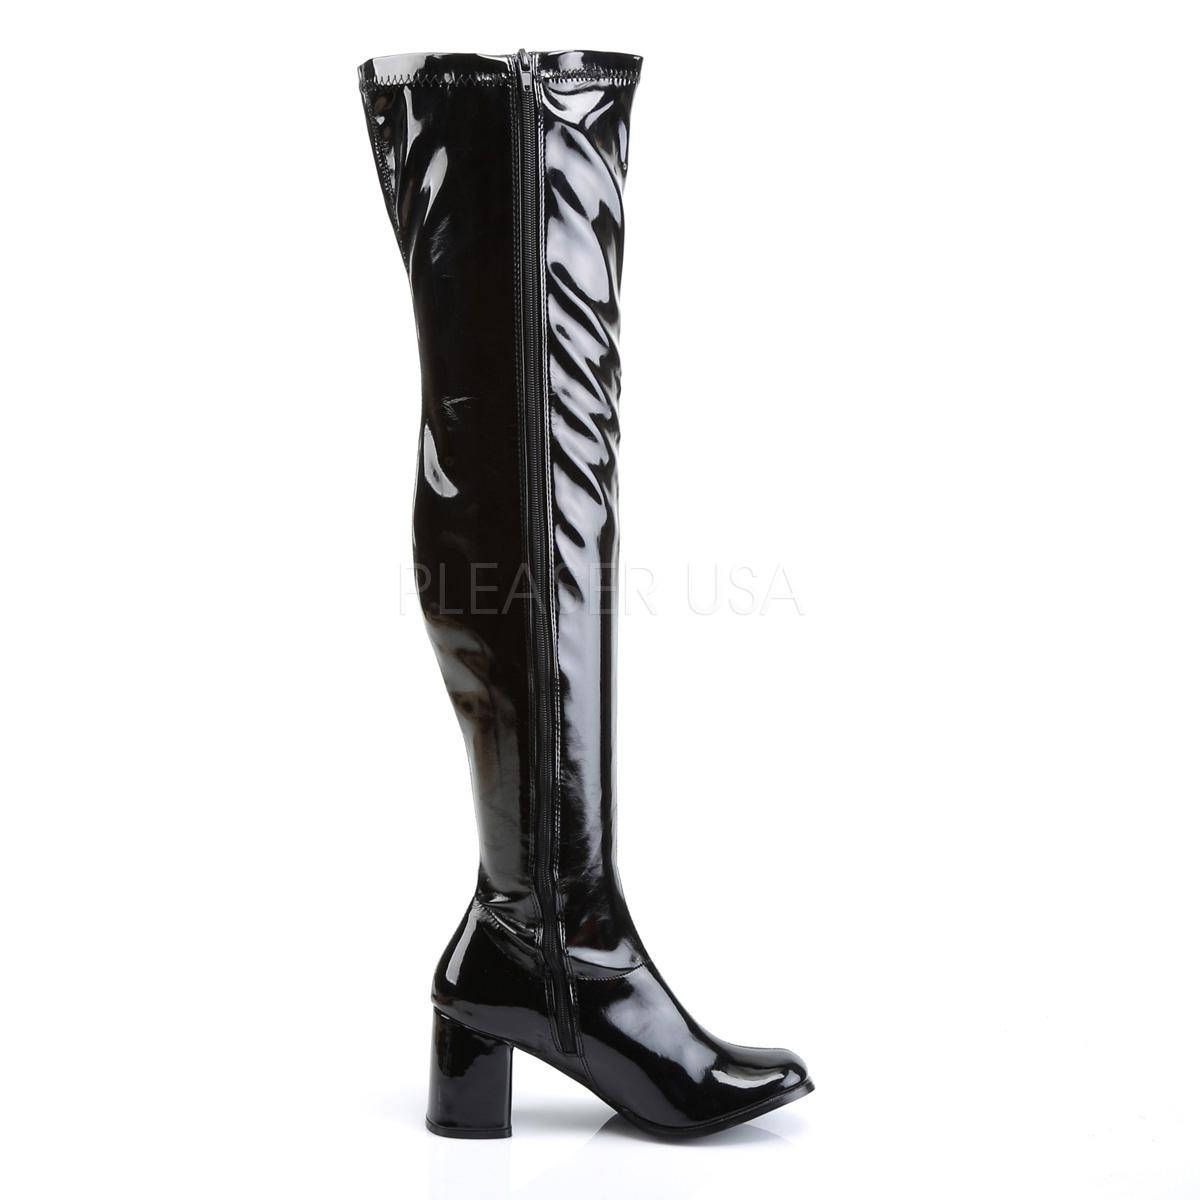 FUNTASMA(Pleaser) GOGO-3000 エナメル黒 サイハイブーツ ひざ上ロングブーツ オーバーニーブーツ ストレッチ ひざ上ニーハイブーツ コスプレ 衣装 レディース